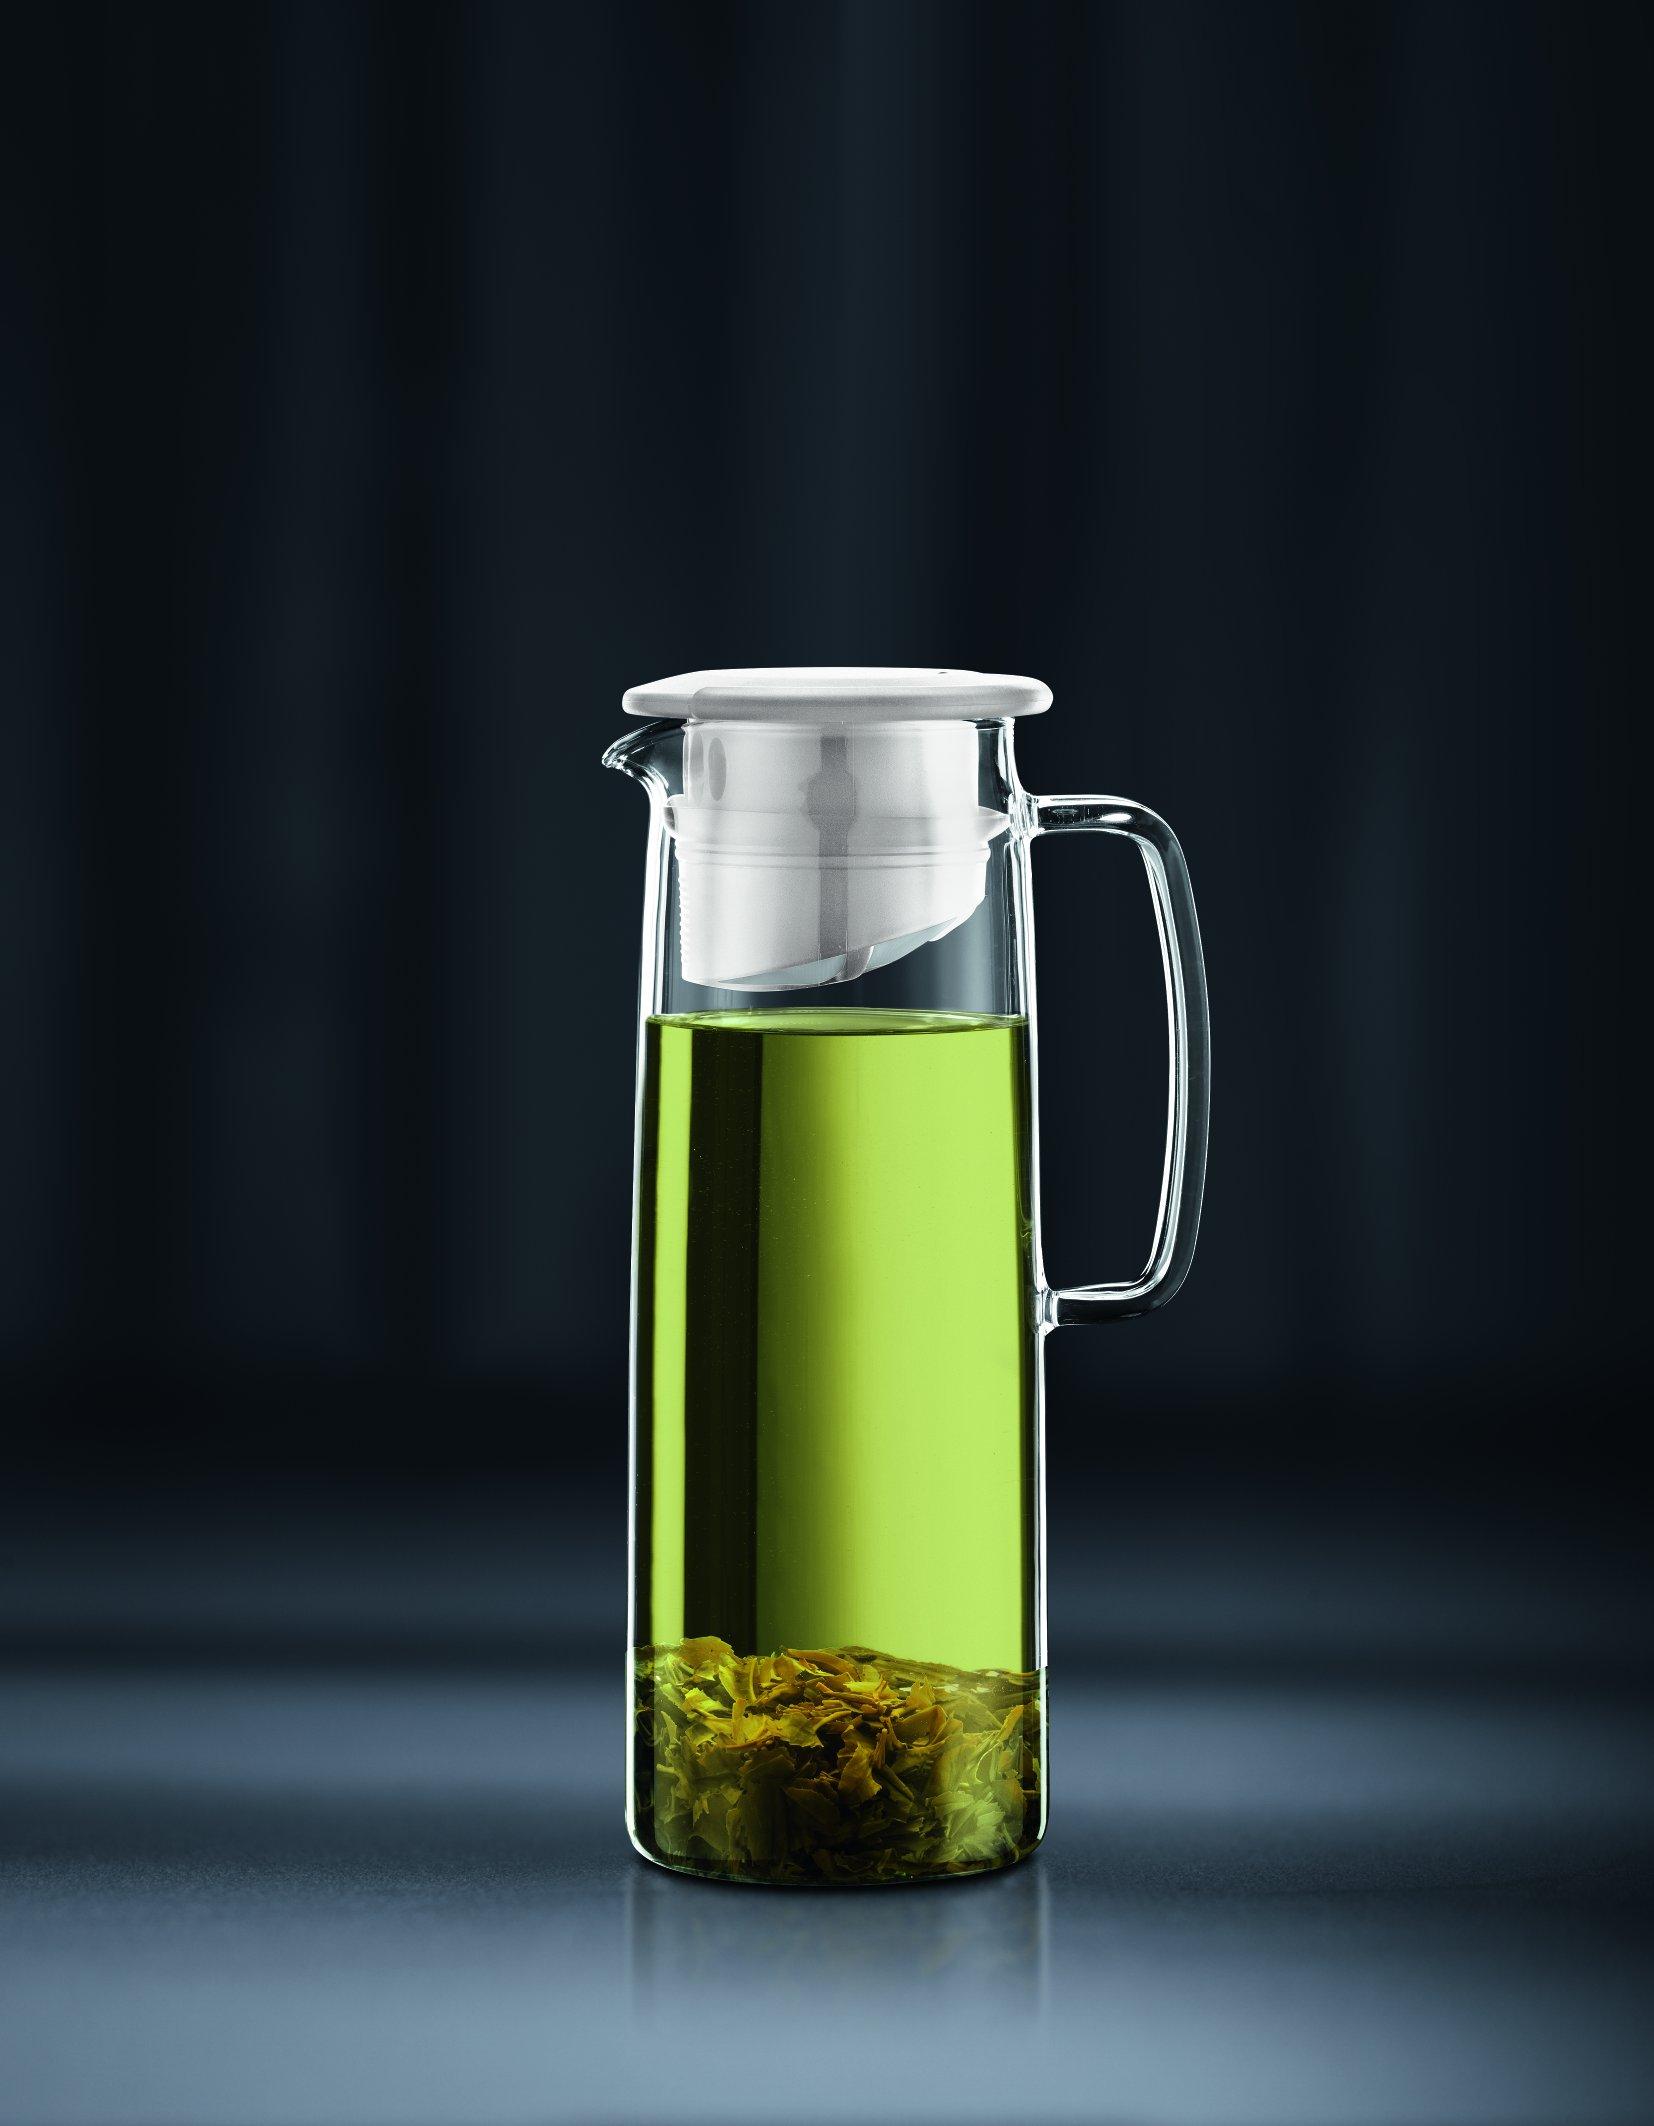 Bodum Biasca Ice Green Tea Jug, 40 oz, White by Bodum (Image #2)